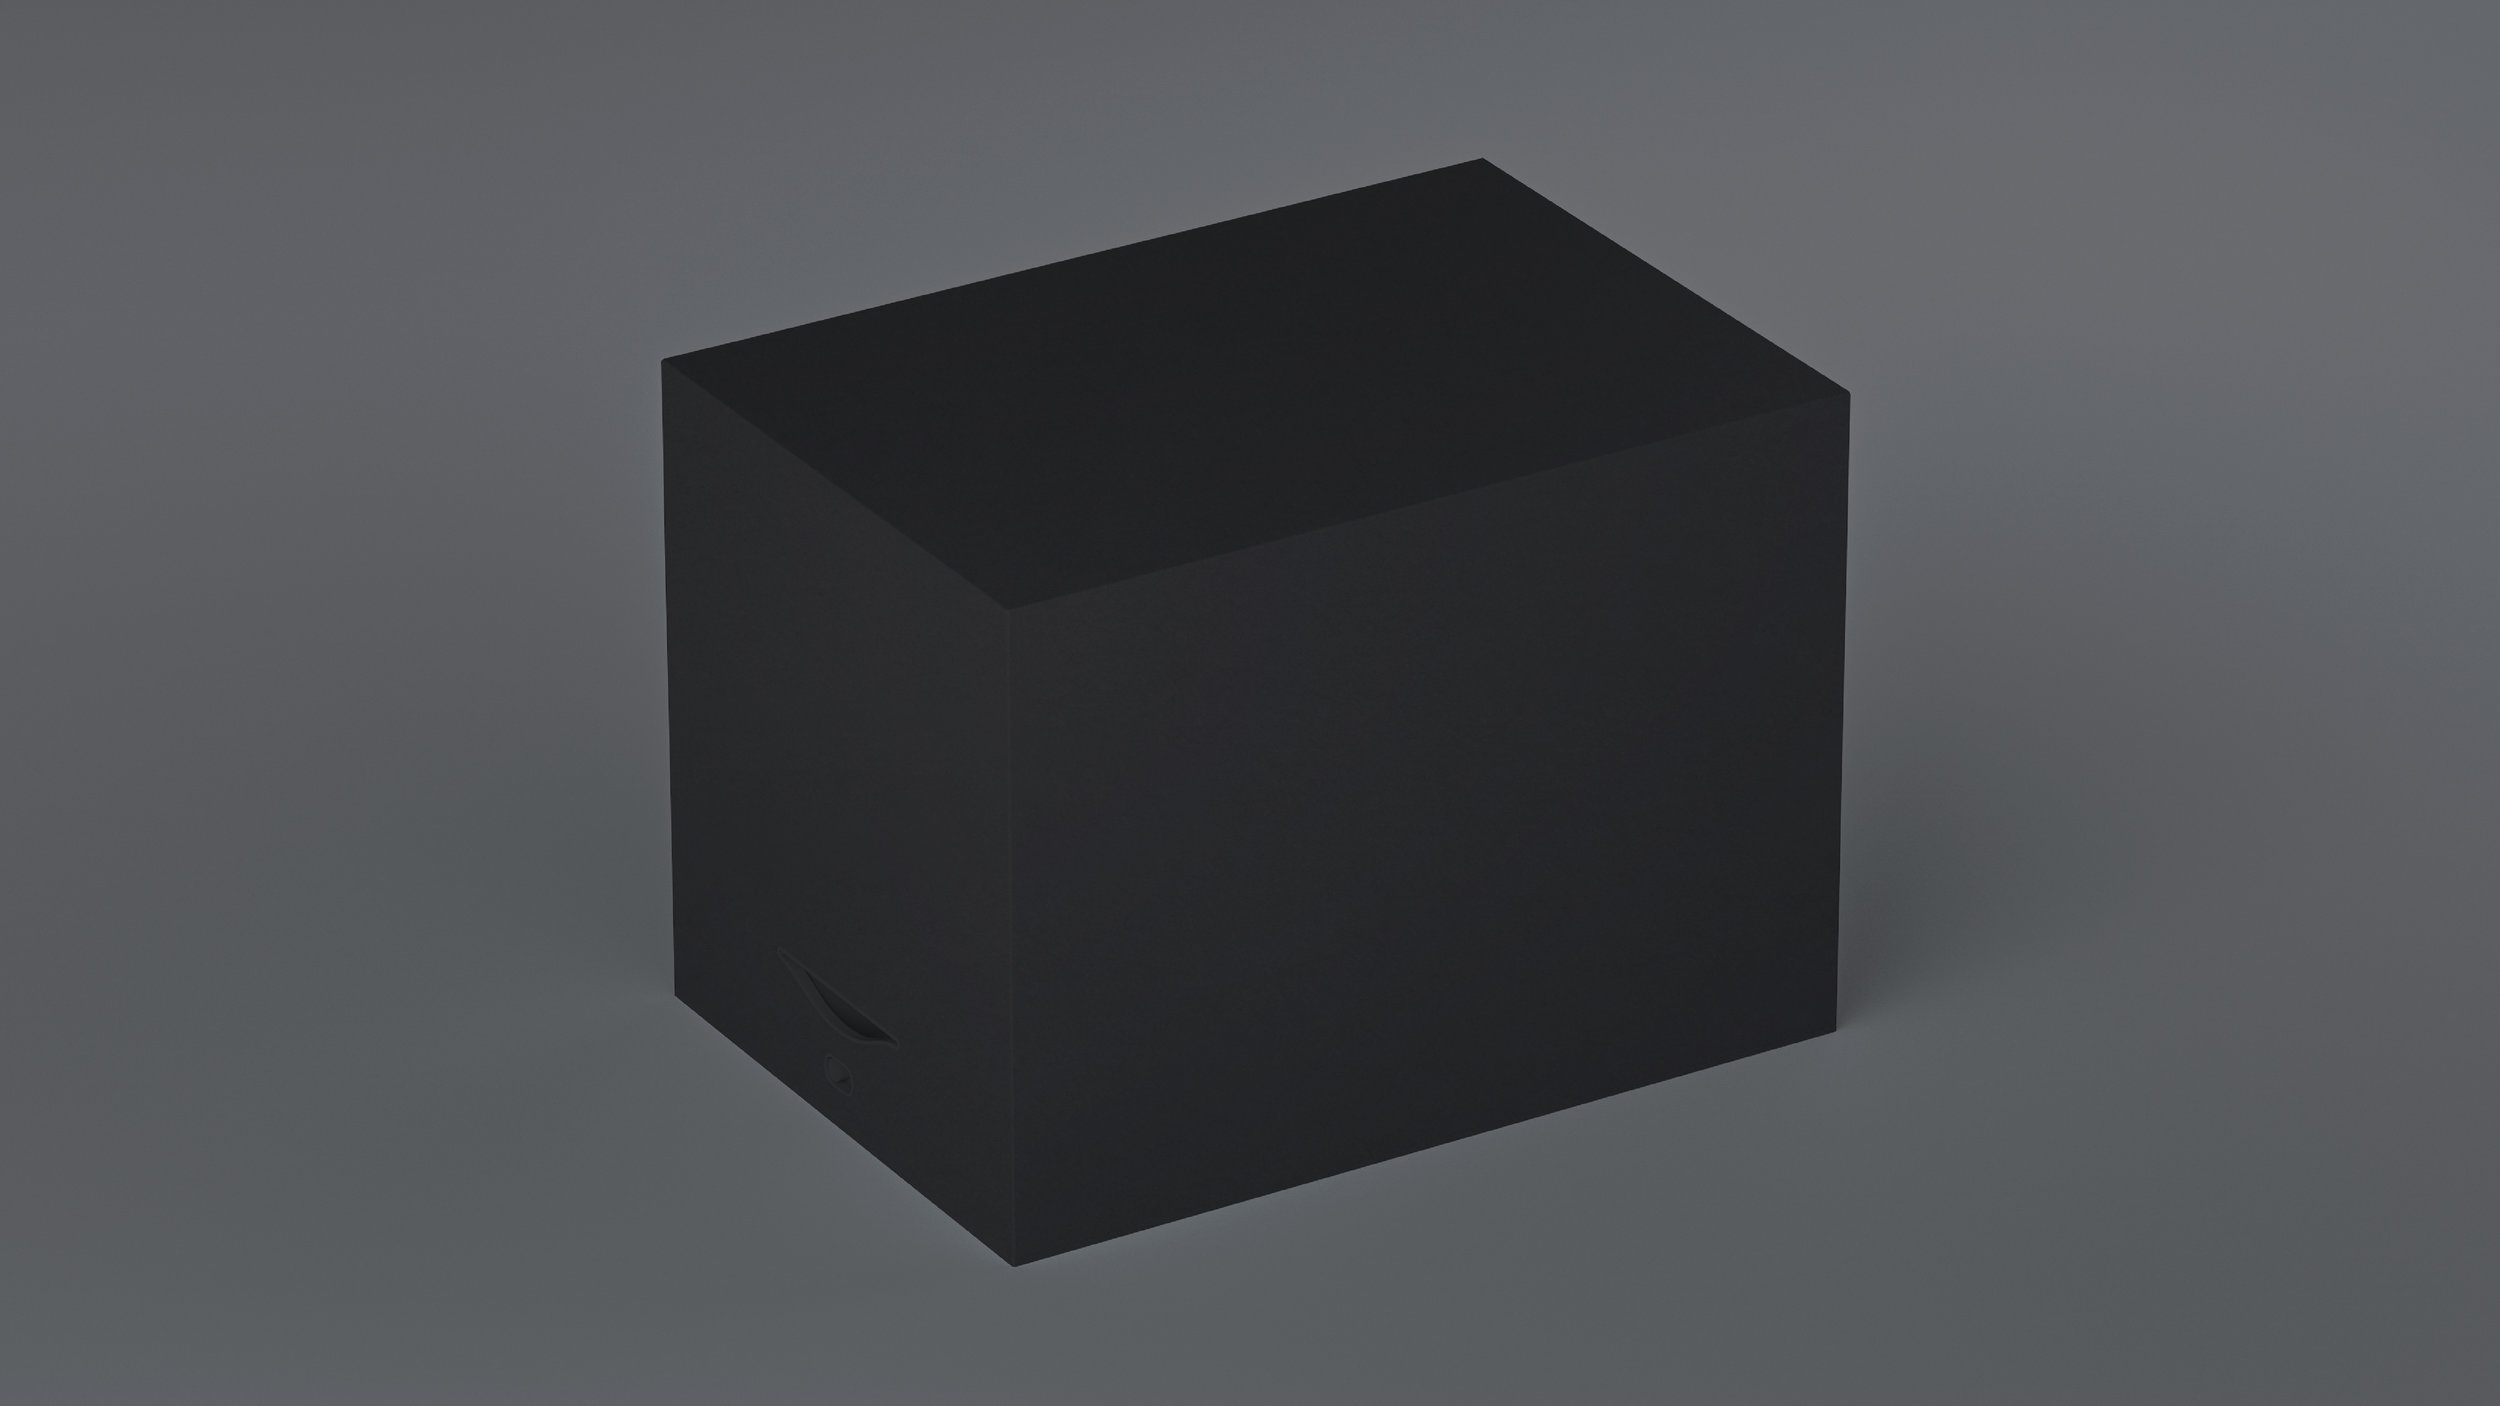 B&W_LibertySuite_PackagingStructure_R17.jpg